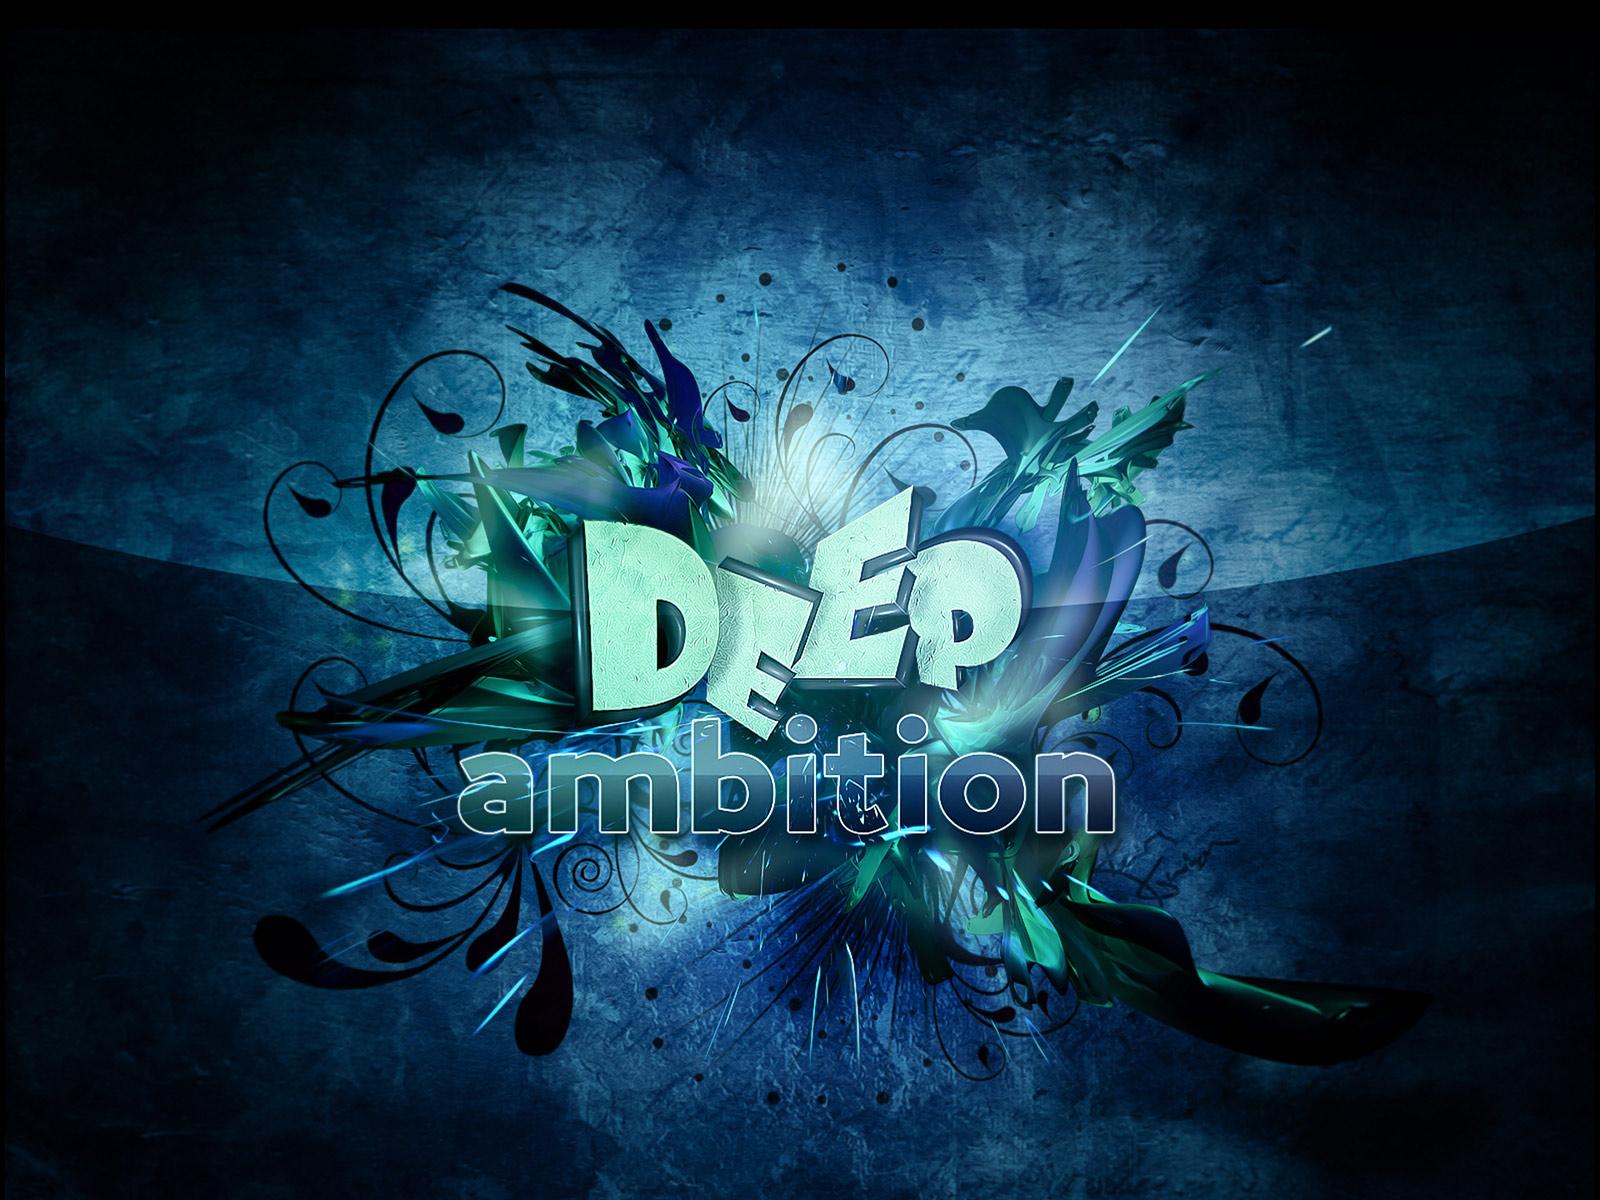 Deep Ambition HD wallpapers, Desktop wallpaper - most viewed